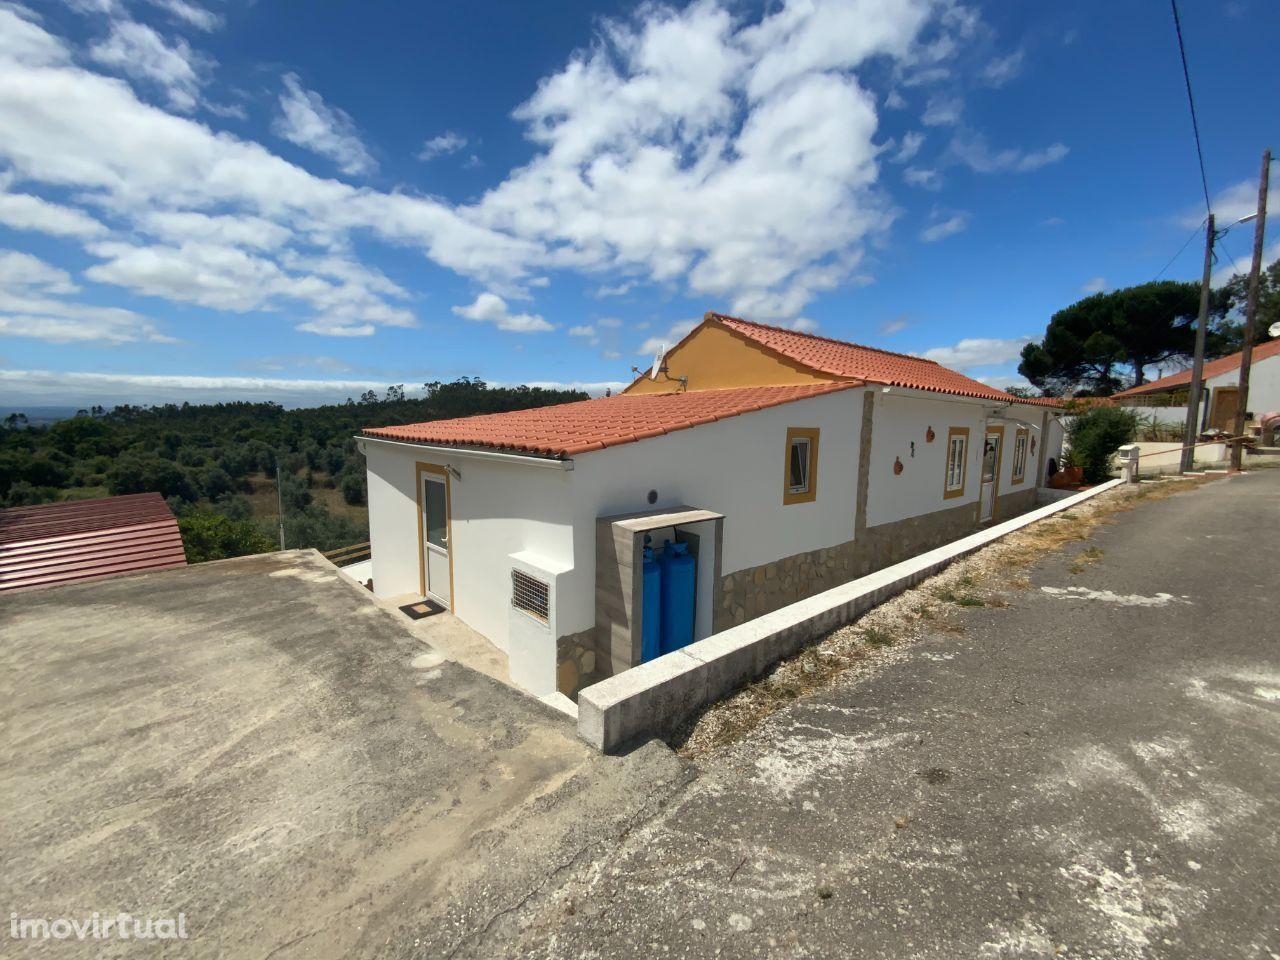 Propriedade portuguesa de estilo tradicional maravilhosamente renovada